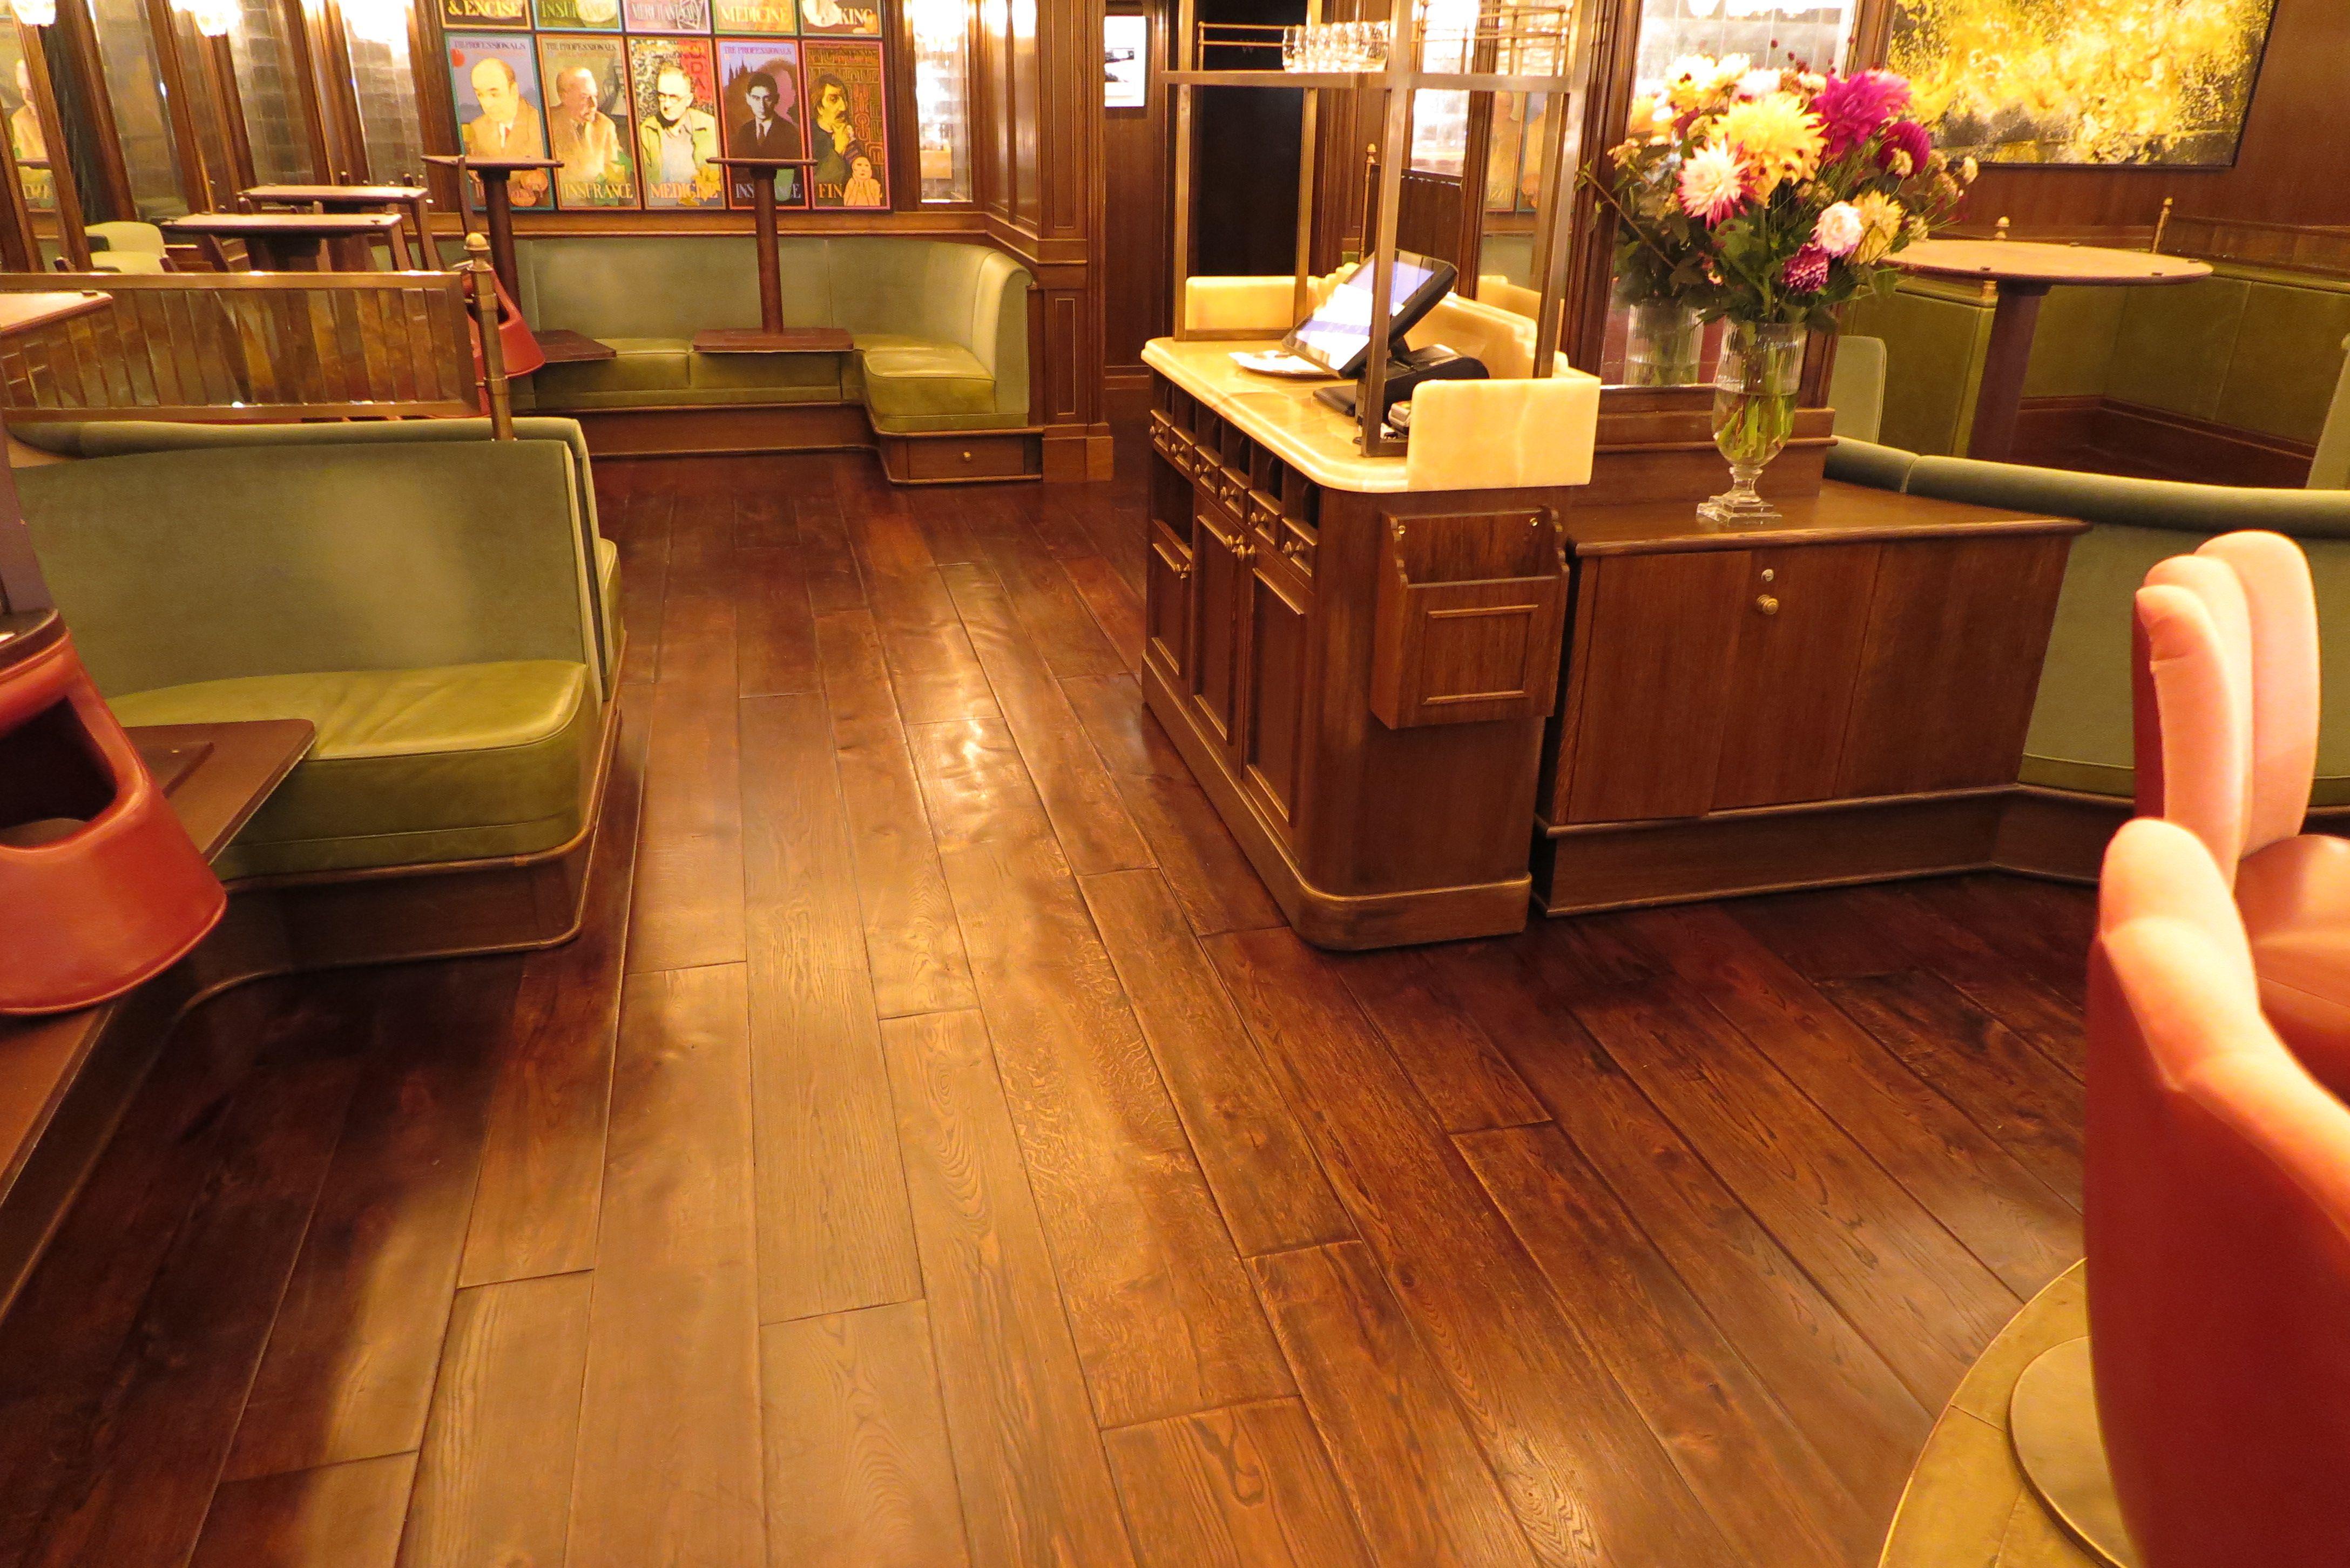 Aged Oak Flooring With Underfloor Heating